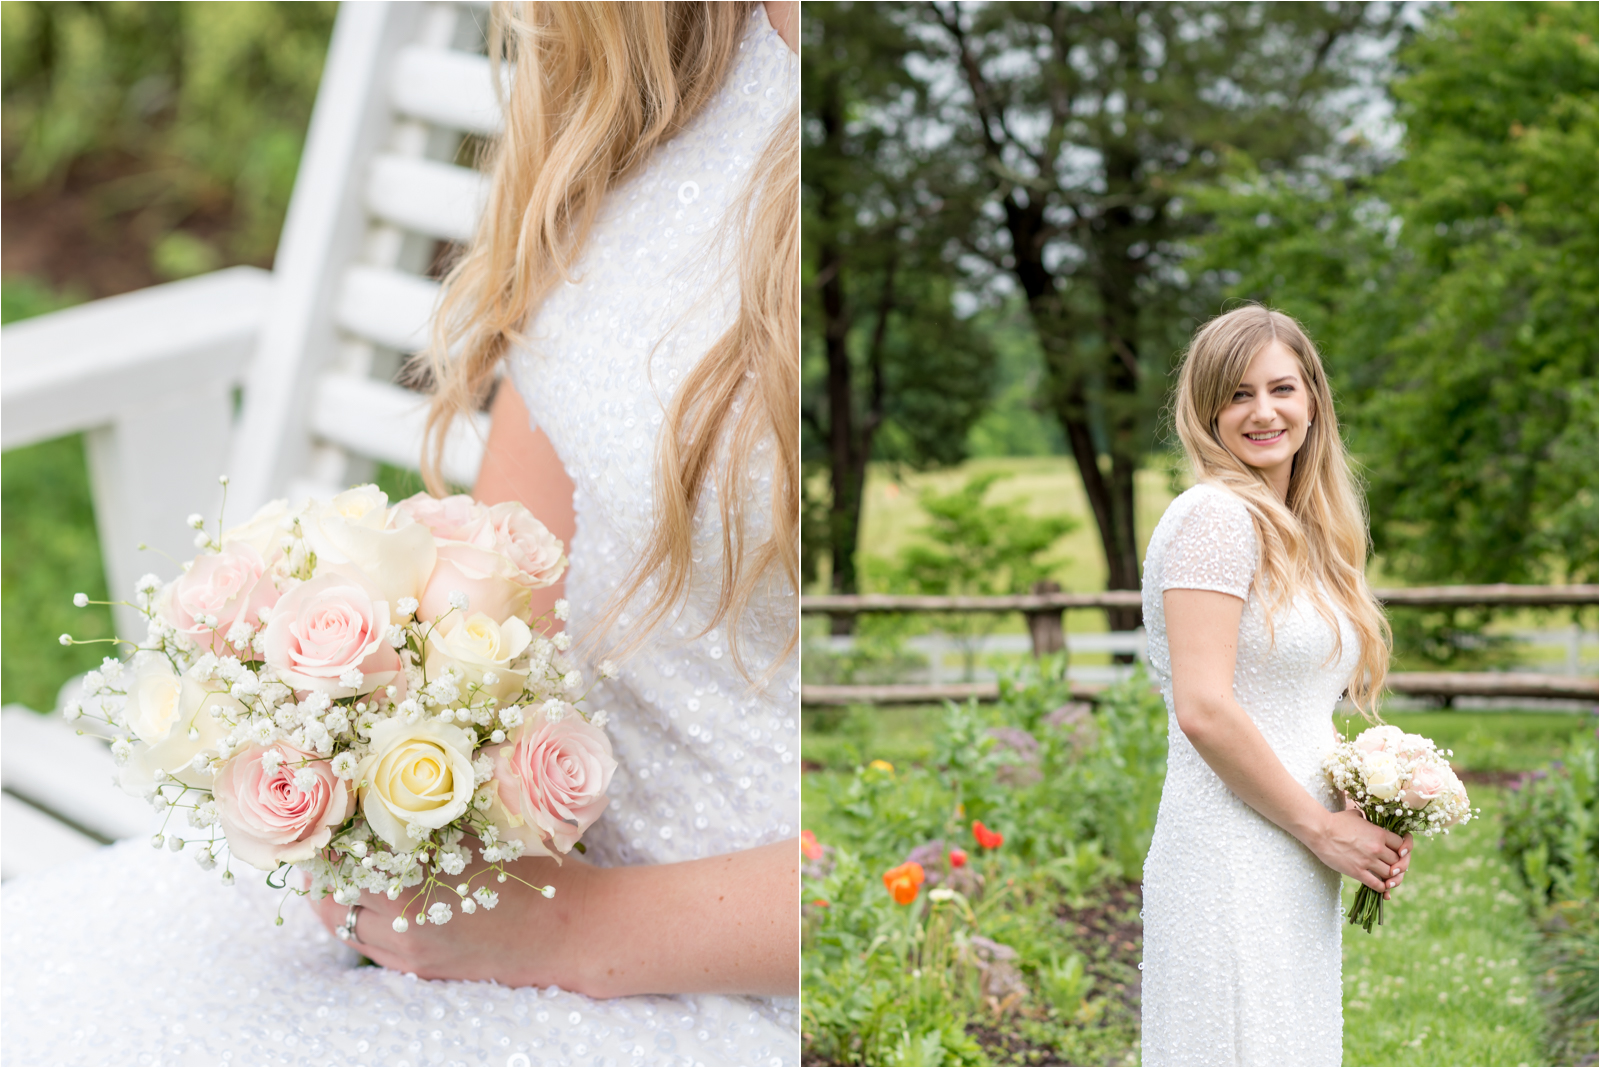 wedding-elopement-tuckahoe-plantation-gardens-bridge-richmond-virginia-rva-jessica-capozzola-focus-on-joy-photography